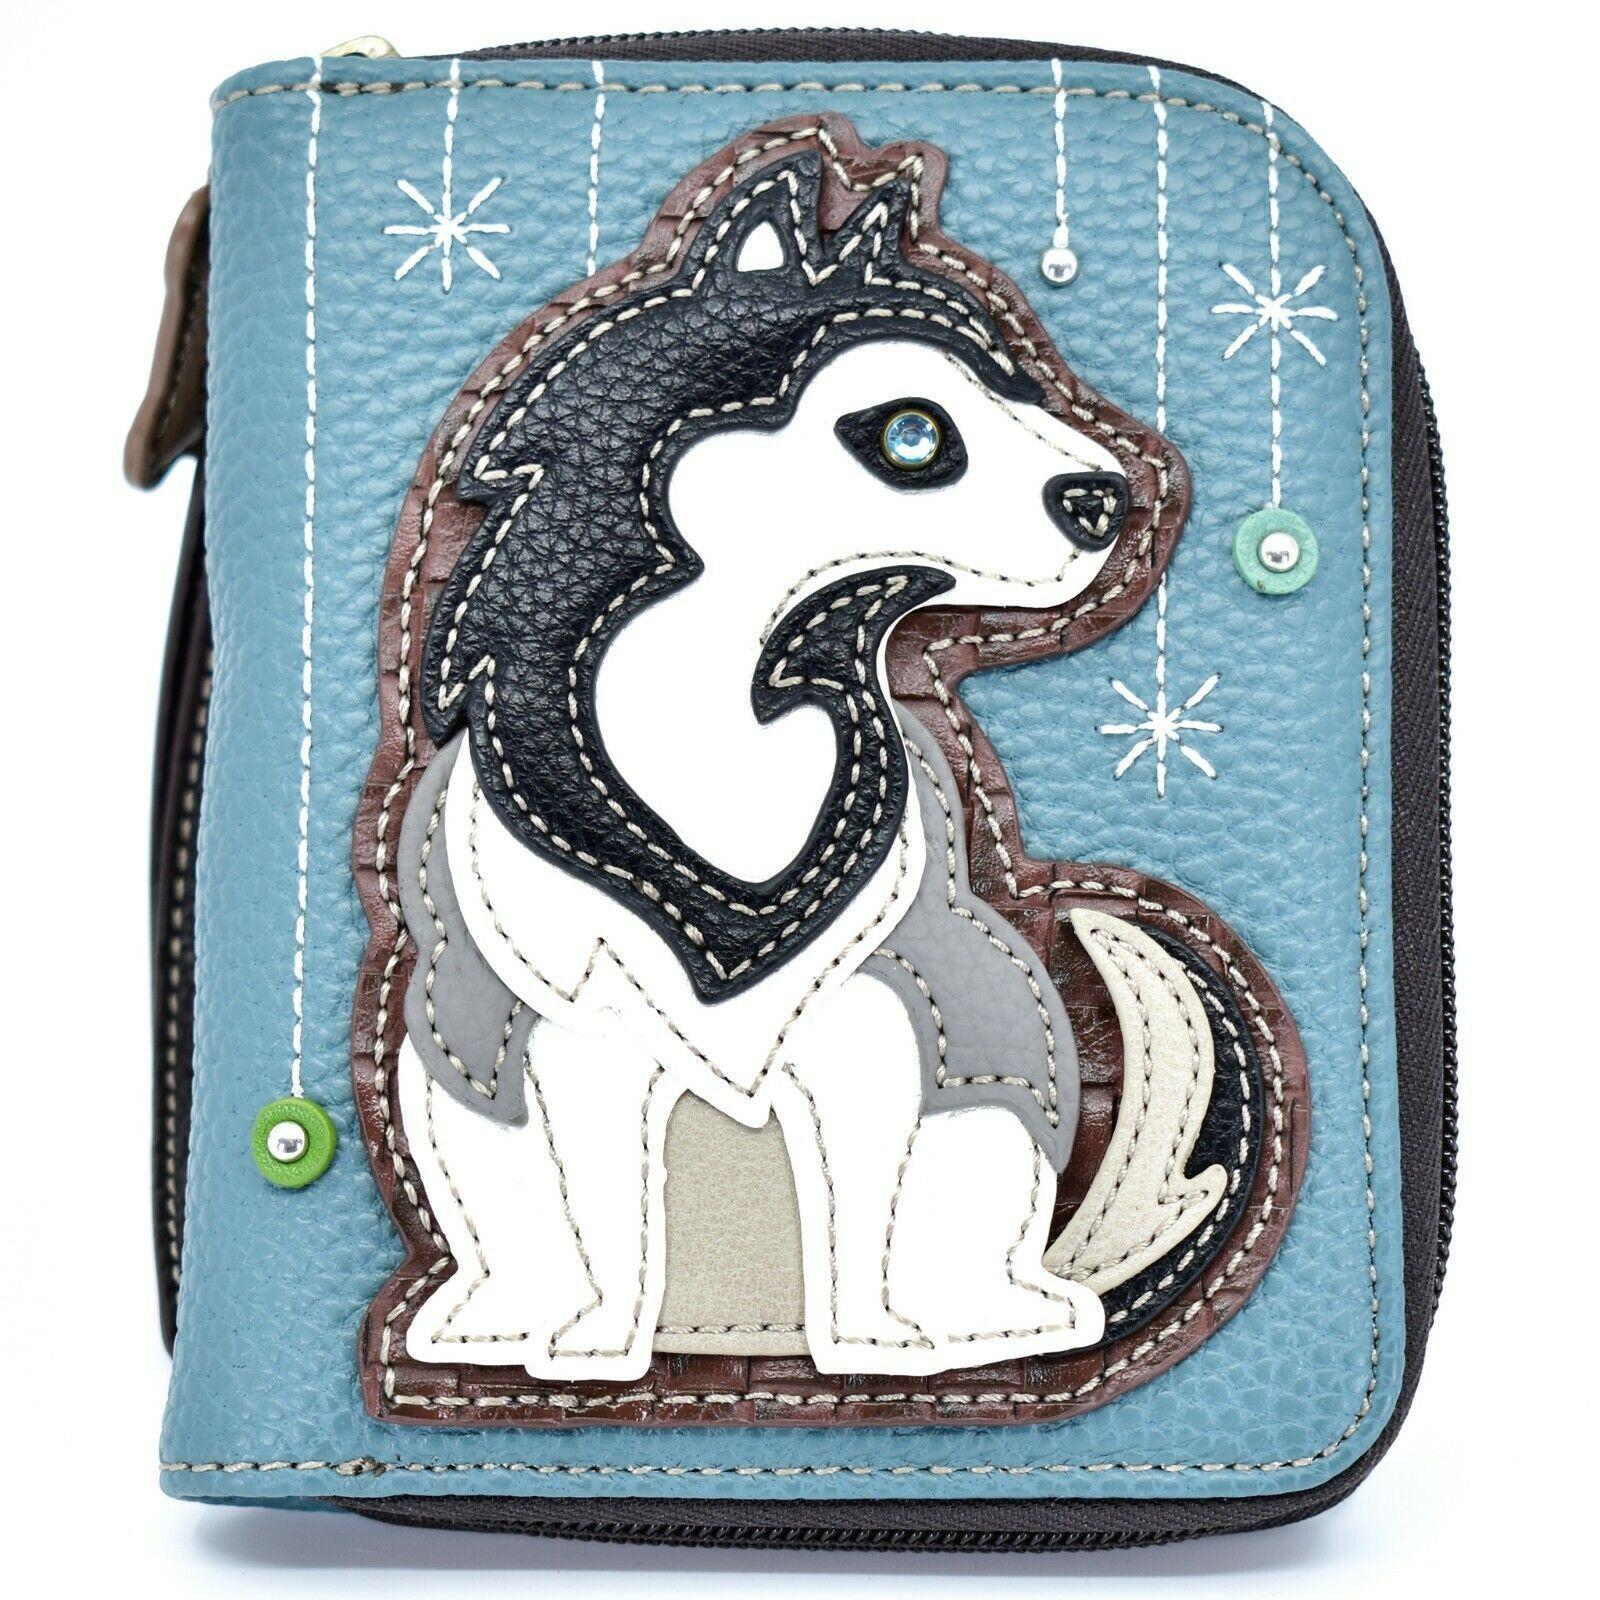 Chala Handbags Faux Leather Whimsical Siberian Husky Zip Around Wristlet Wallet